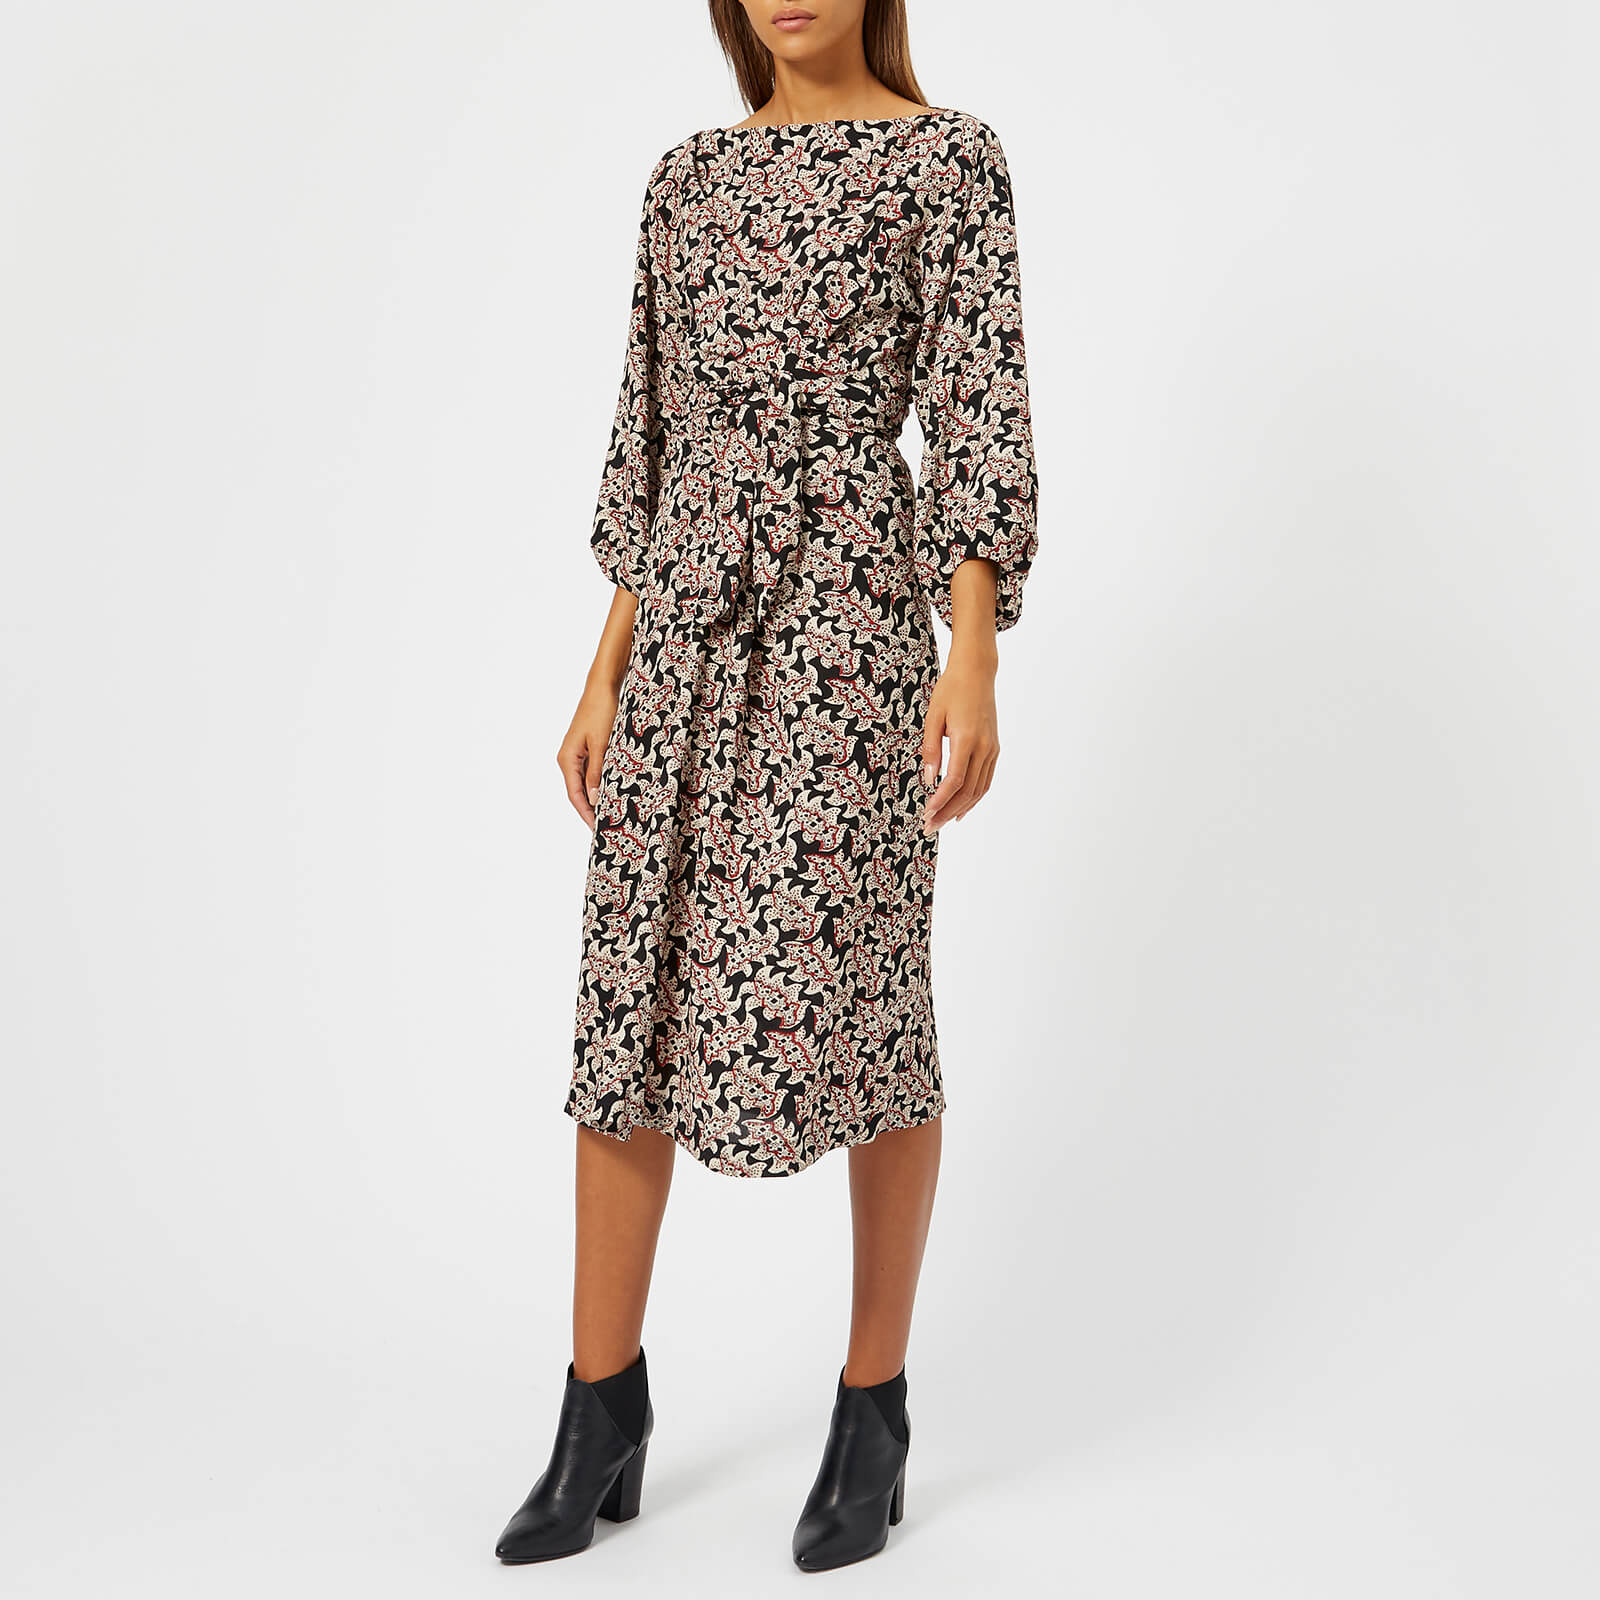 8d844a5556 Isabel Marant Étoile Women's Lisa Floral Dress - Red/Black - Free UK  Delivery over £50